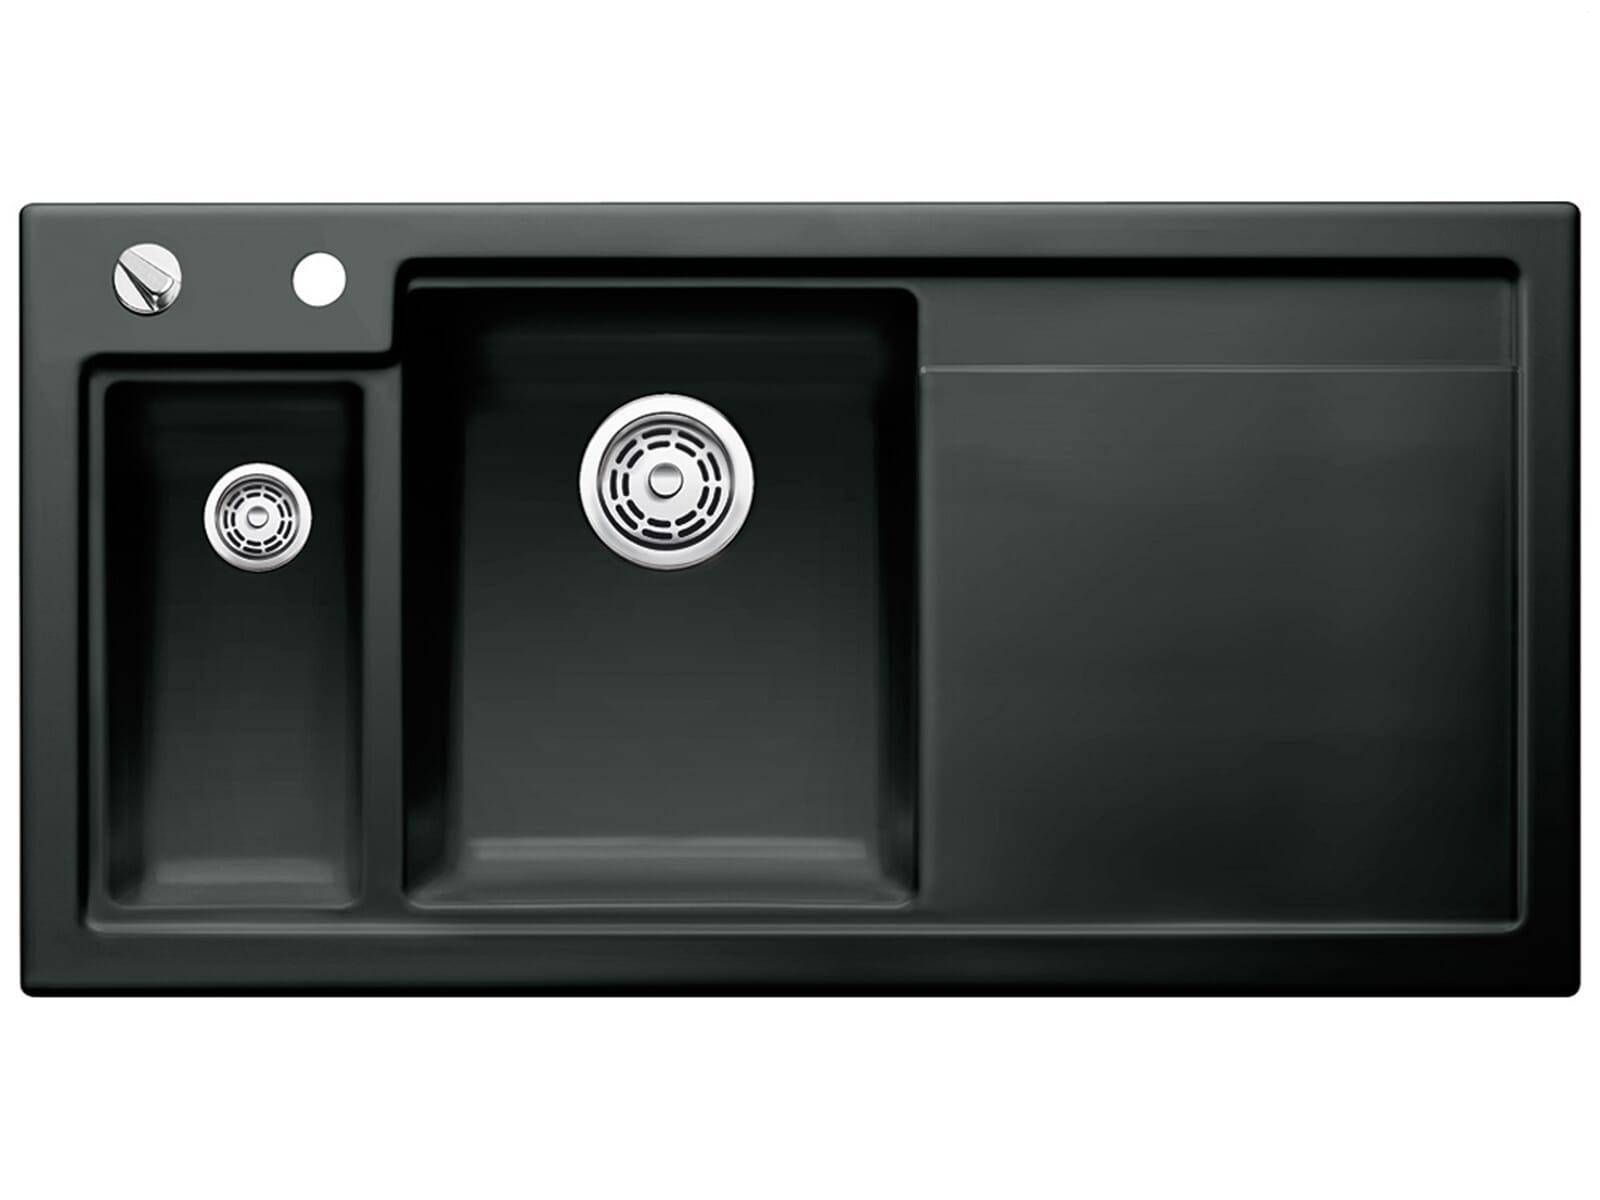 blanco axon ii 6 s schwarz einbau keramiksp le k chen sp le sp lbecken auflage ebay. Black Bedroom Furniture Sets. Home Design Ideas